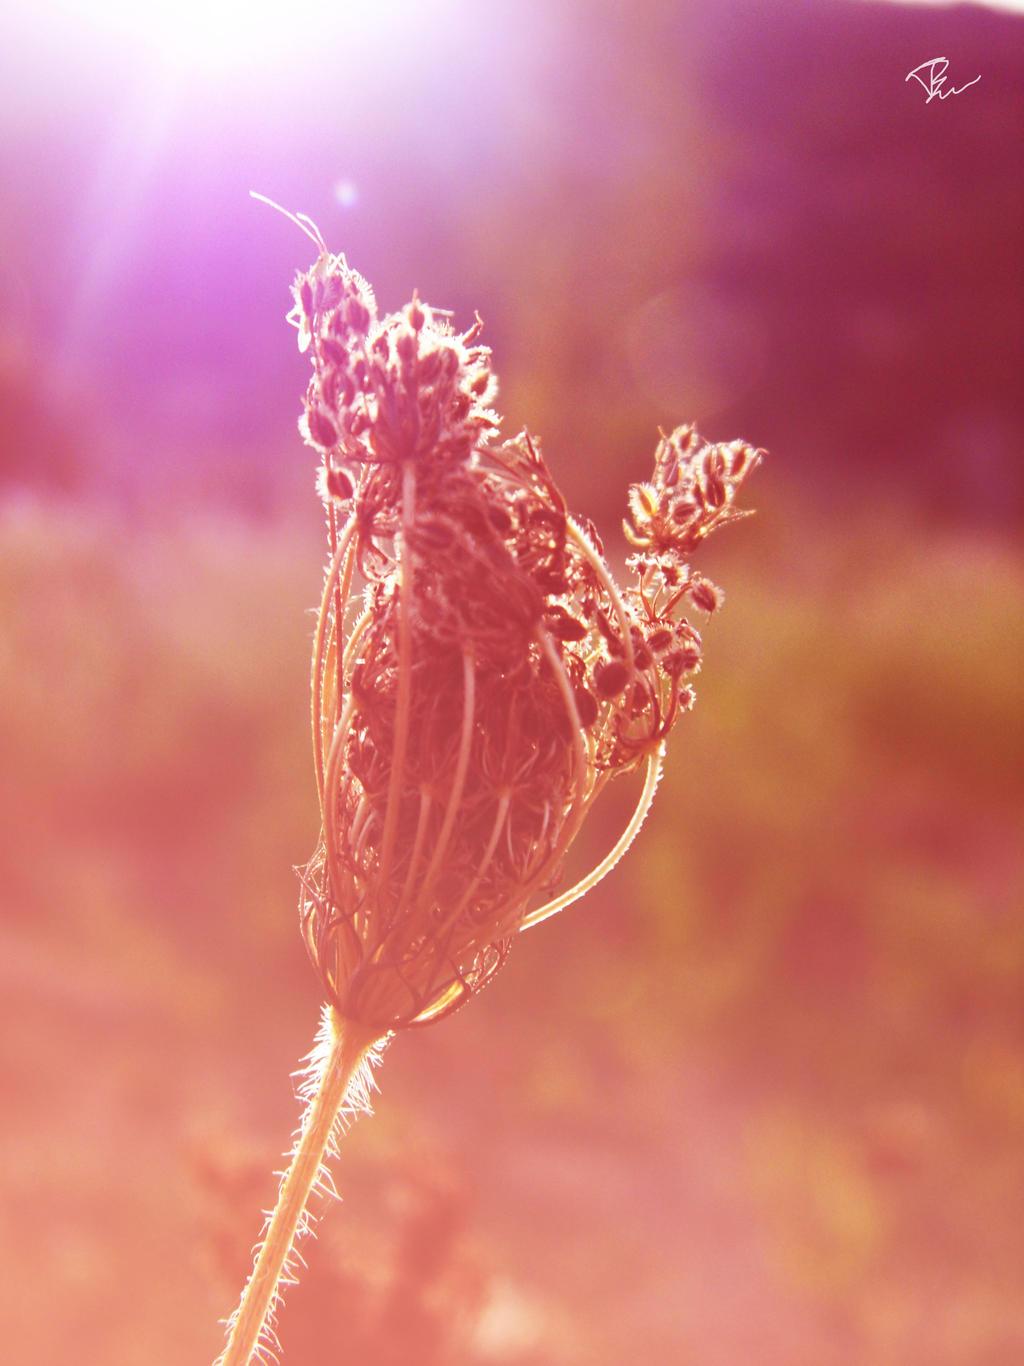 Wind and light by tinuika